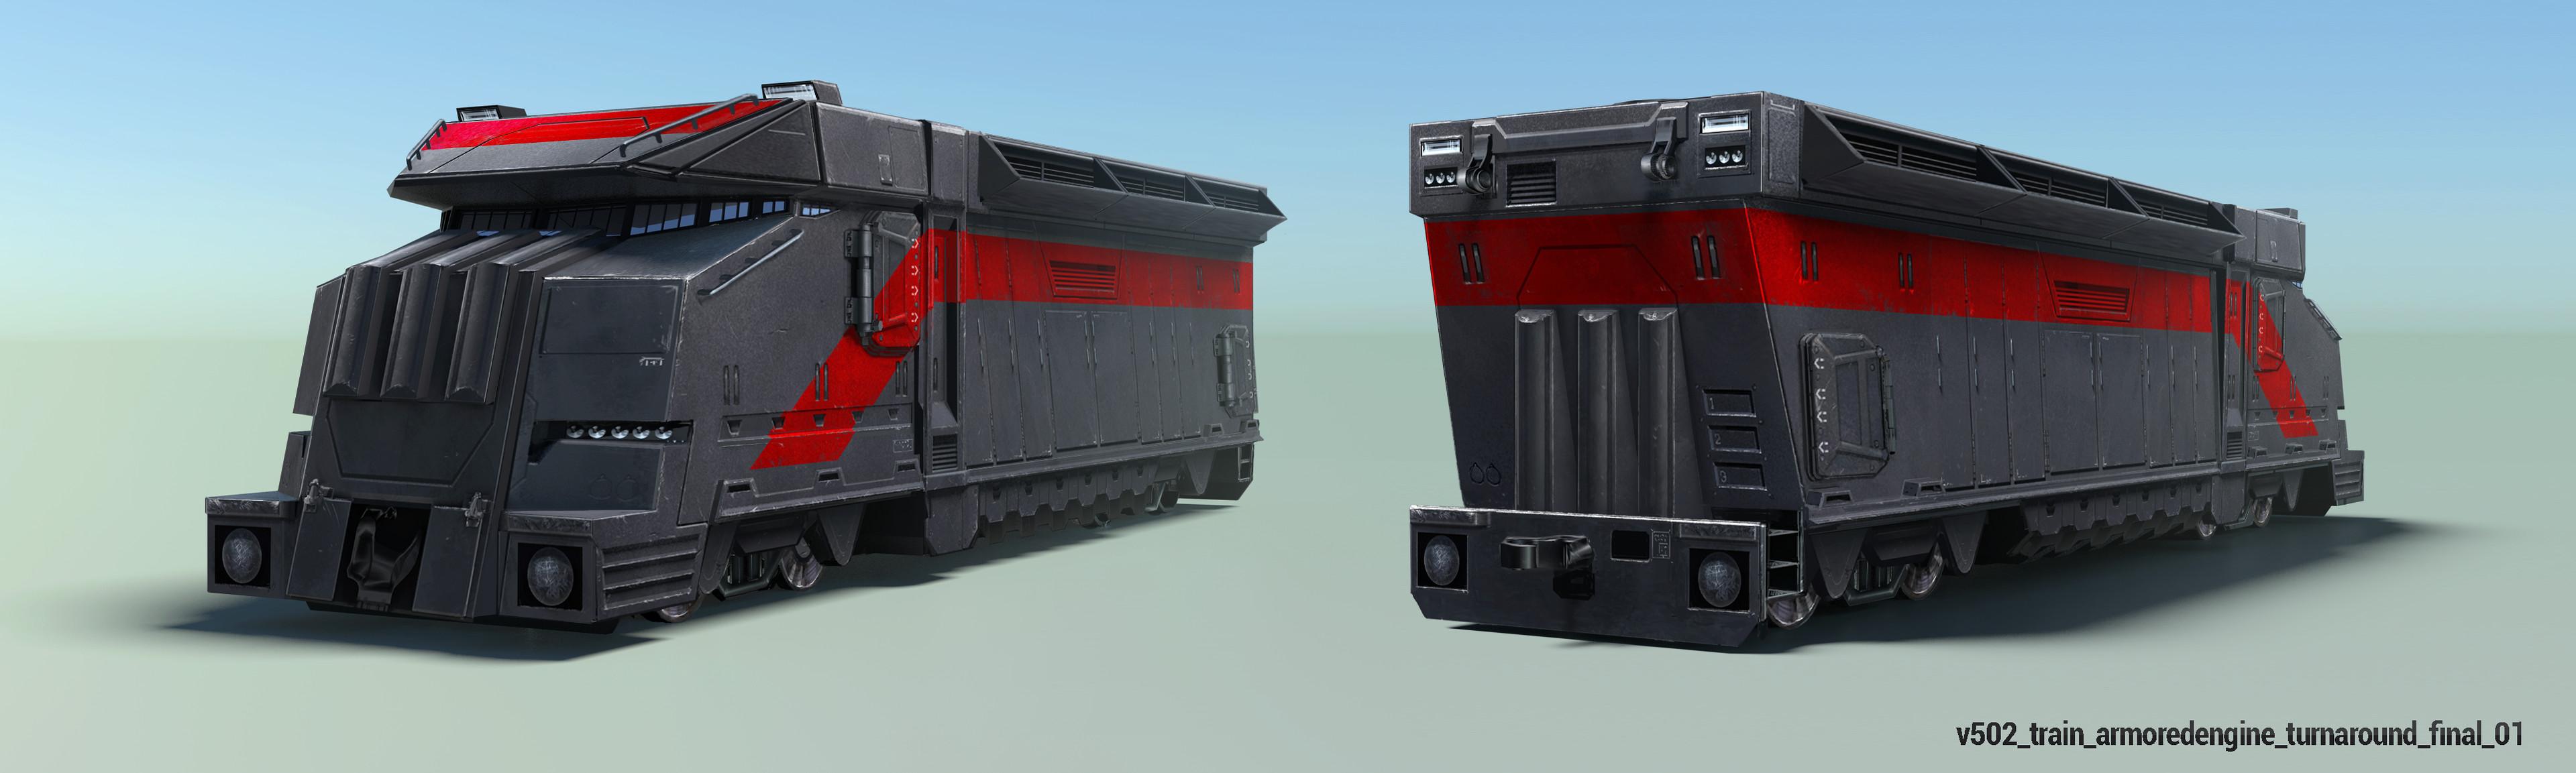 Armored Train Engine Final